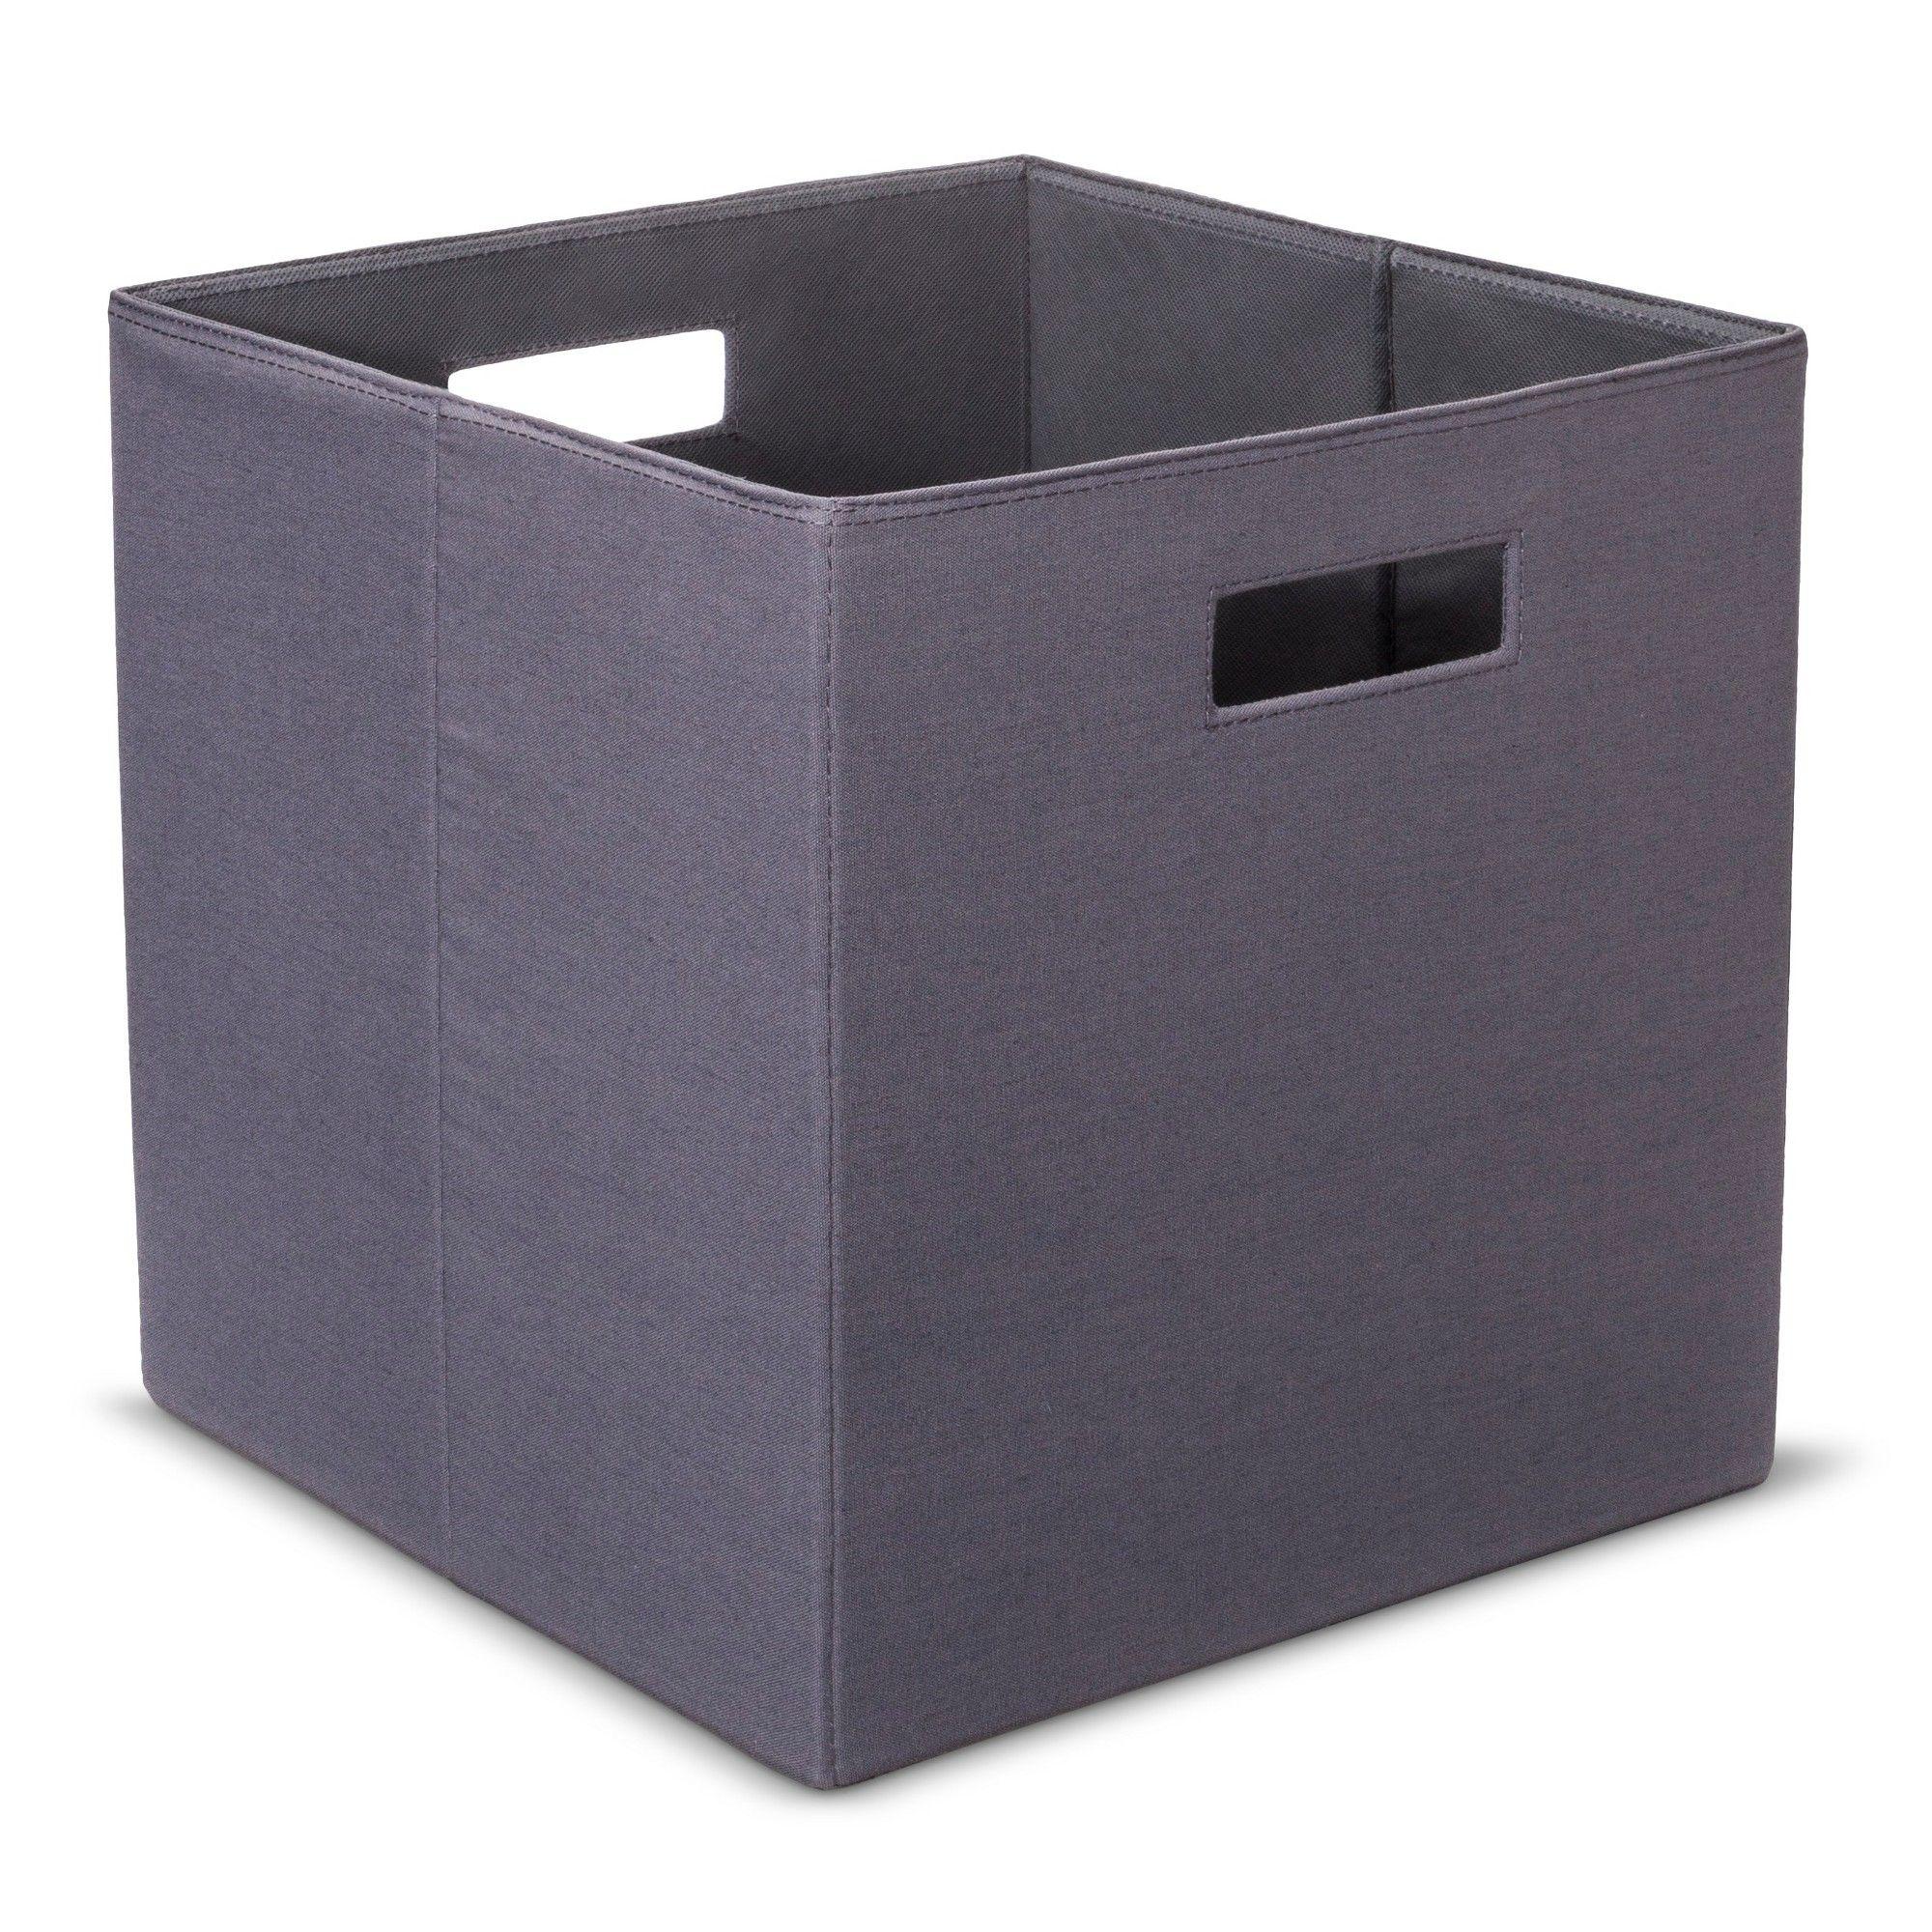 Fabric Cube Storage Bin 13   Threshold, Gray